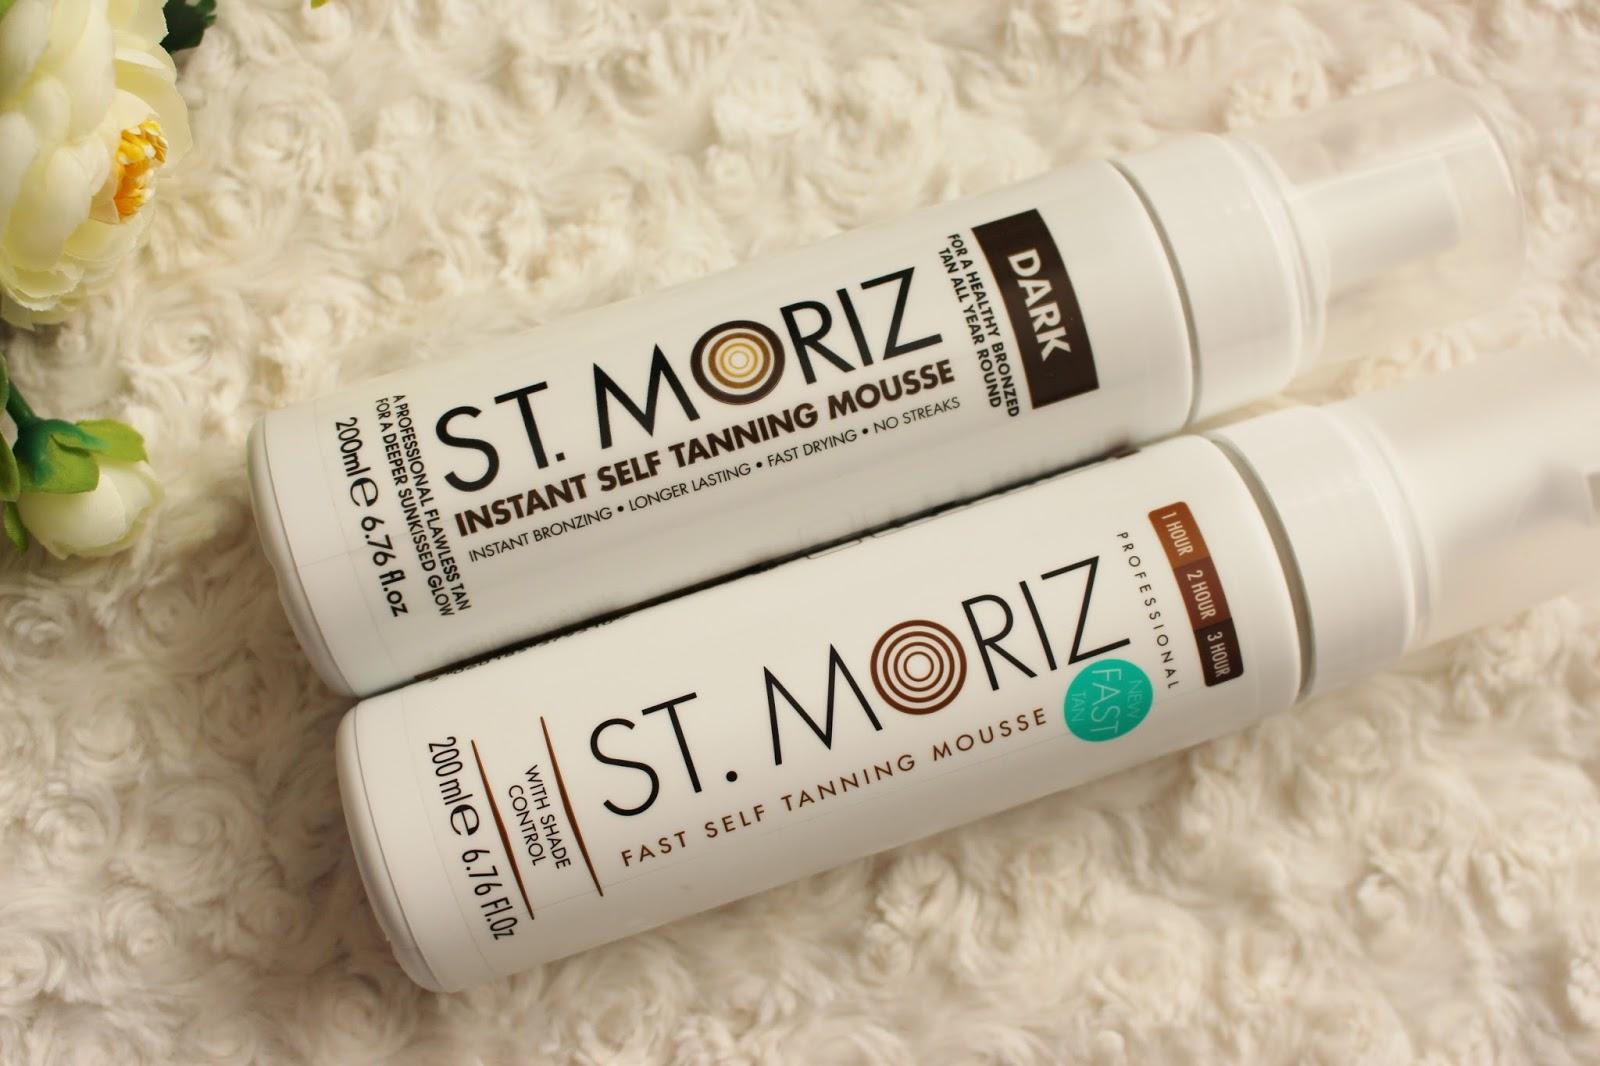 st moriz fast mousse and gradual tanning lotion lottie. Black Bedroom Furniture Sets. Home Design Ideas